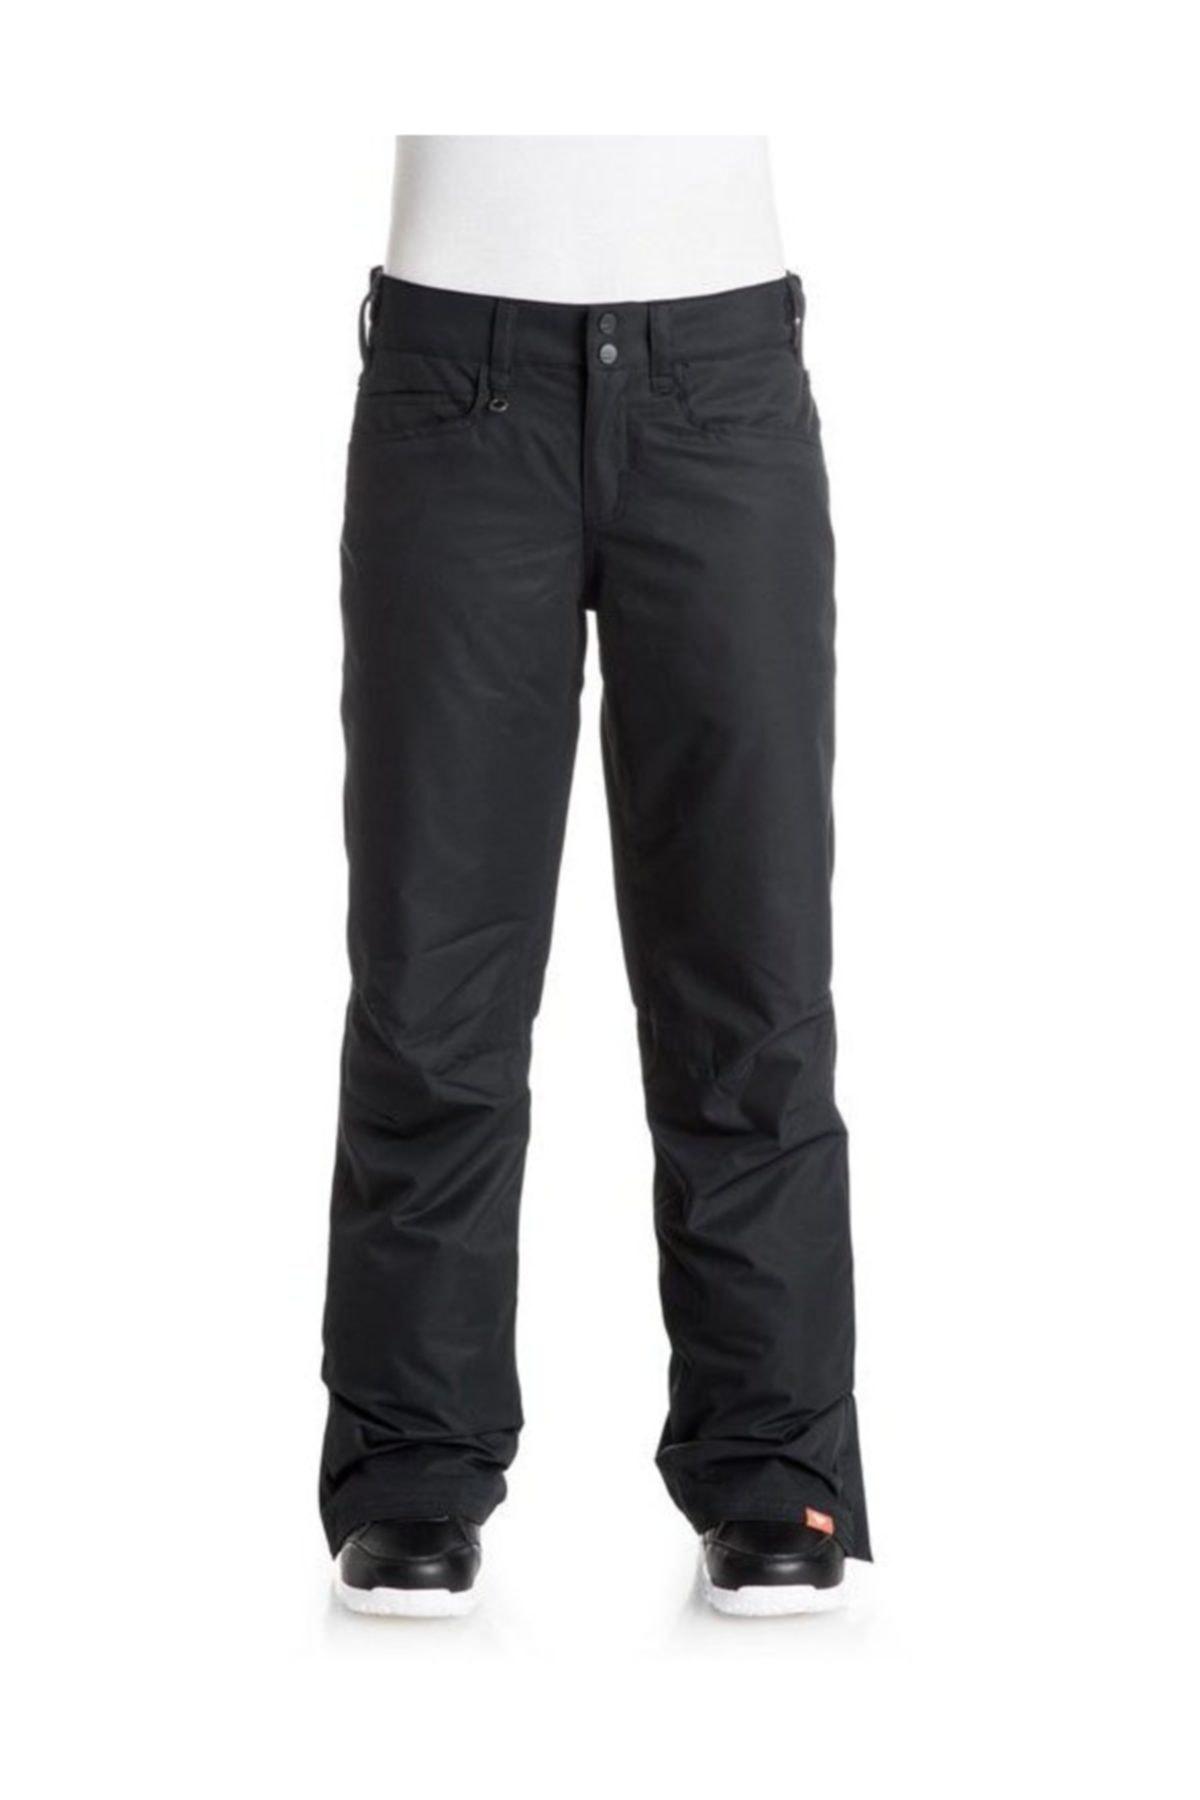 Roxy Backyard PT Kadın Kayak Pantolonu Siyah 2